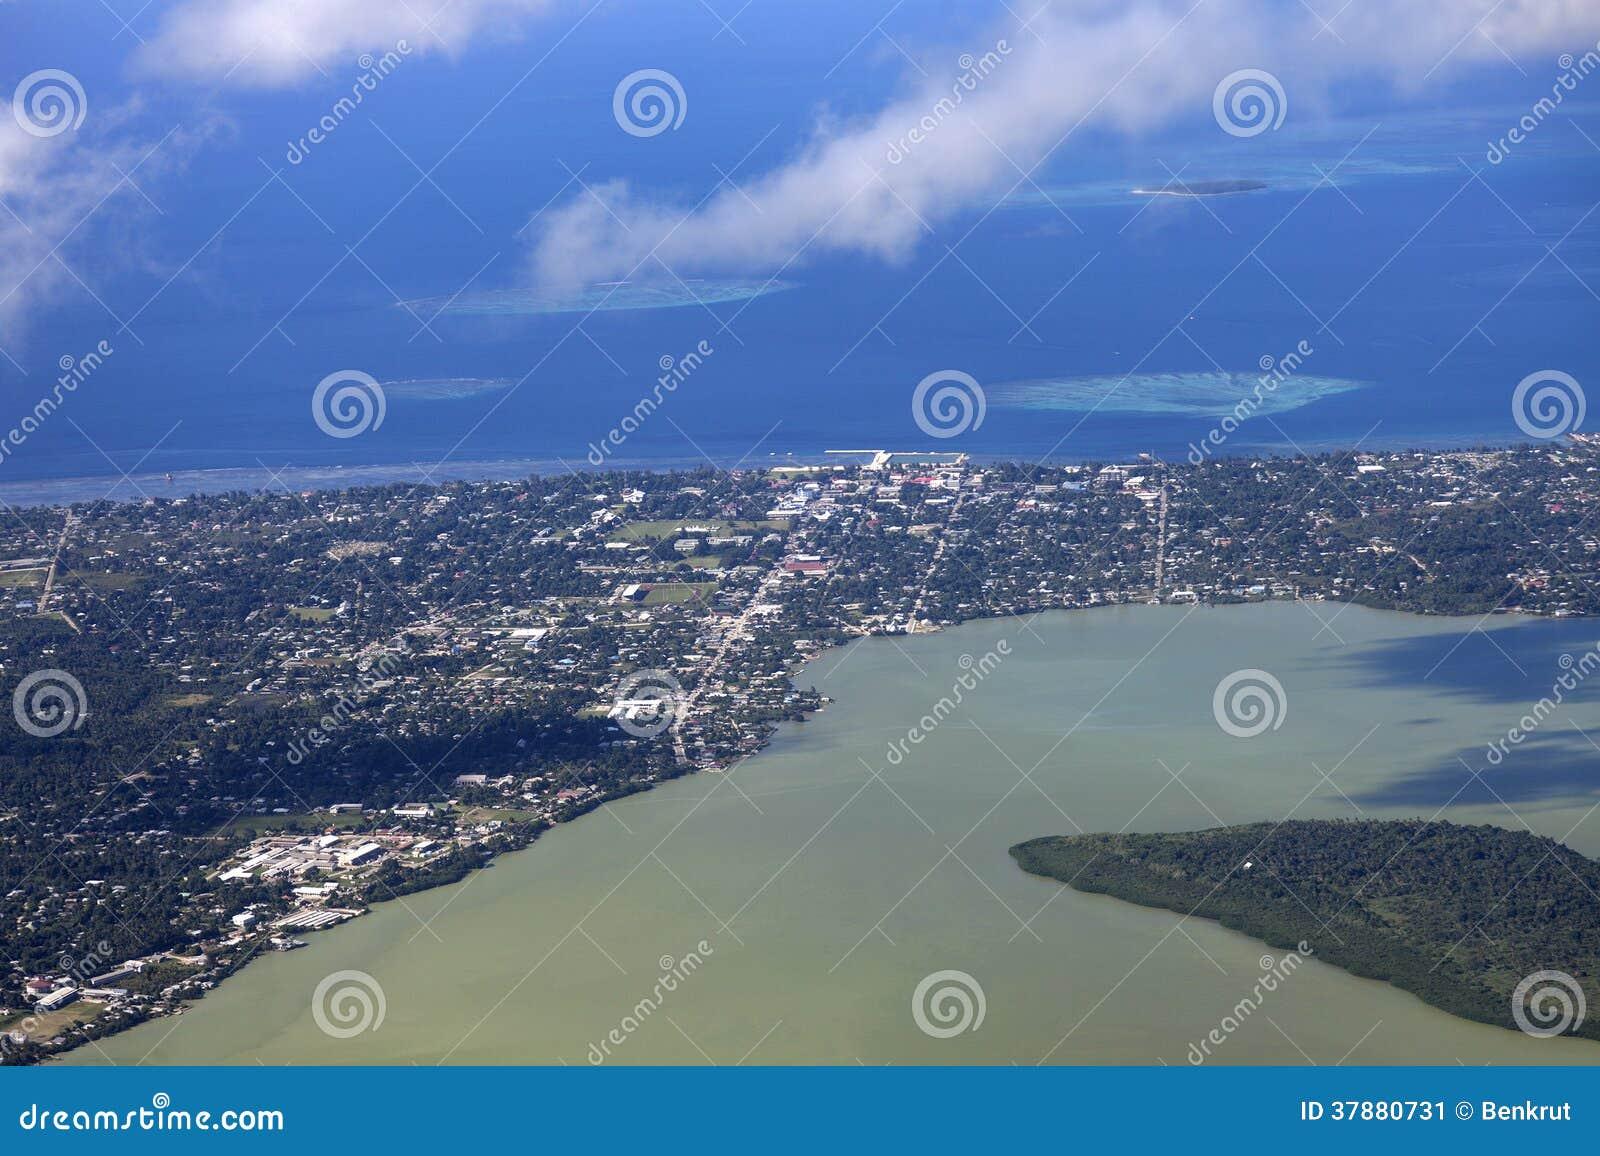 Luchtnuku alofa